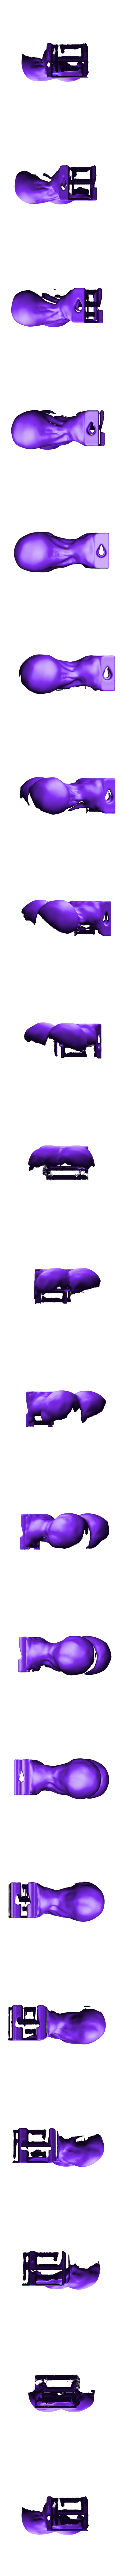 Balls.stl Download STL file Testicle Ballsack Airsoft adapt • 3D printing template, LordLilapause